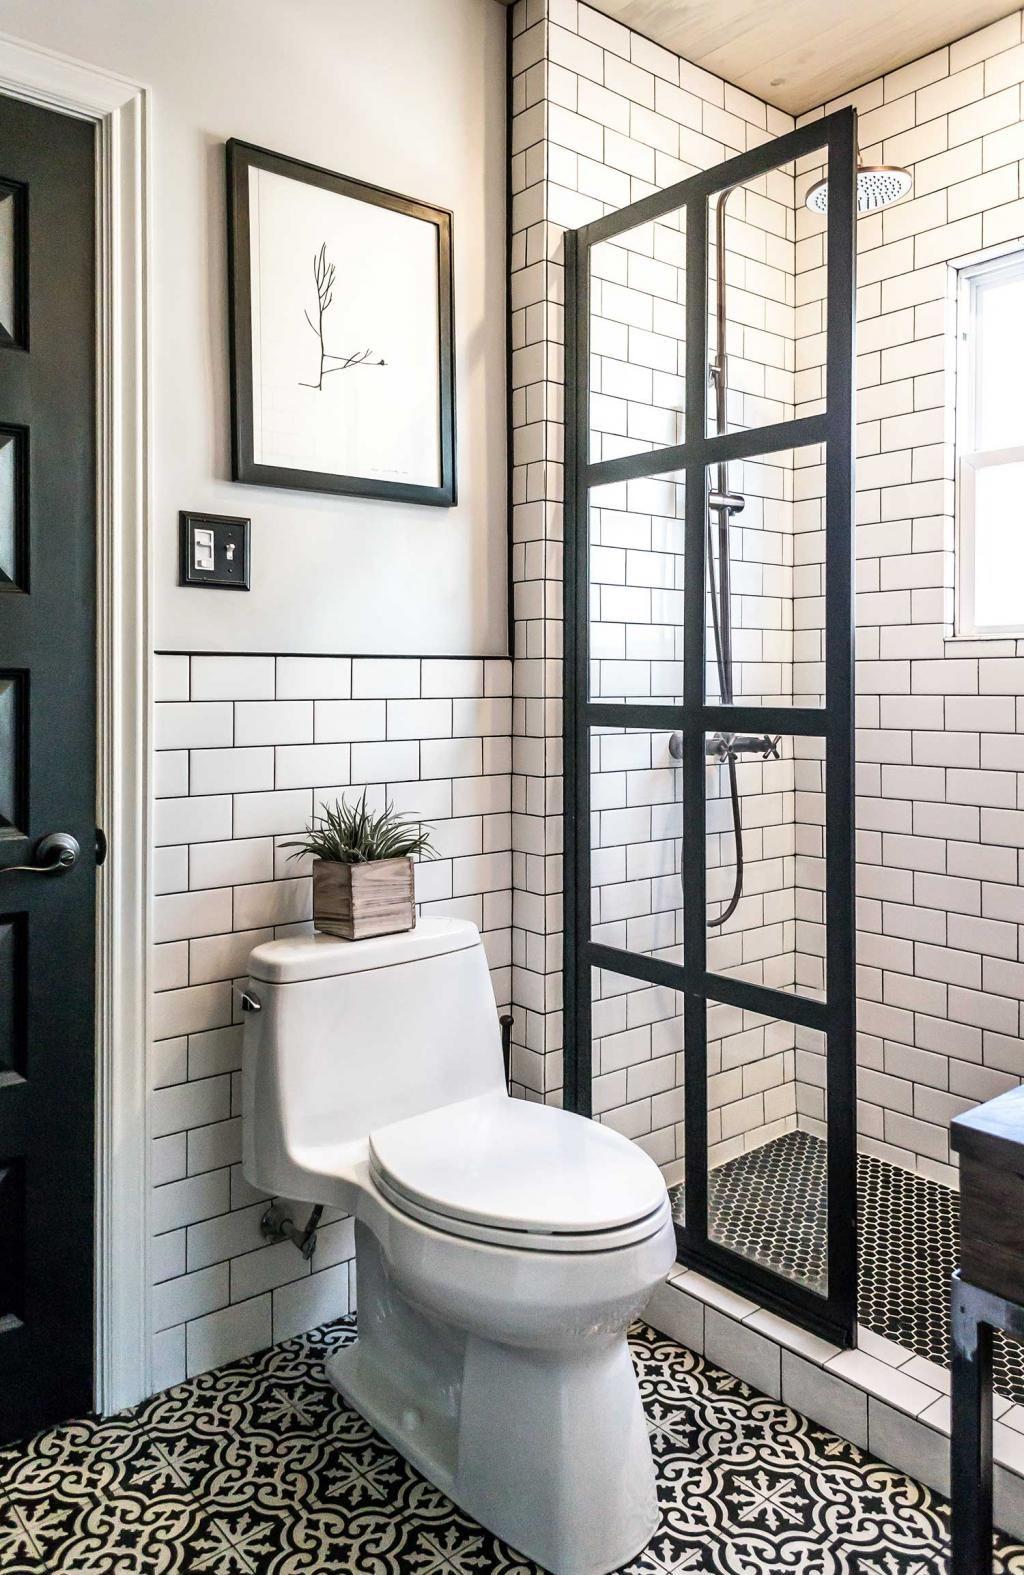 Easy Bathroom Renovation Tips | Pinterest | Easy bathrooms, Easy and ...